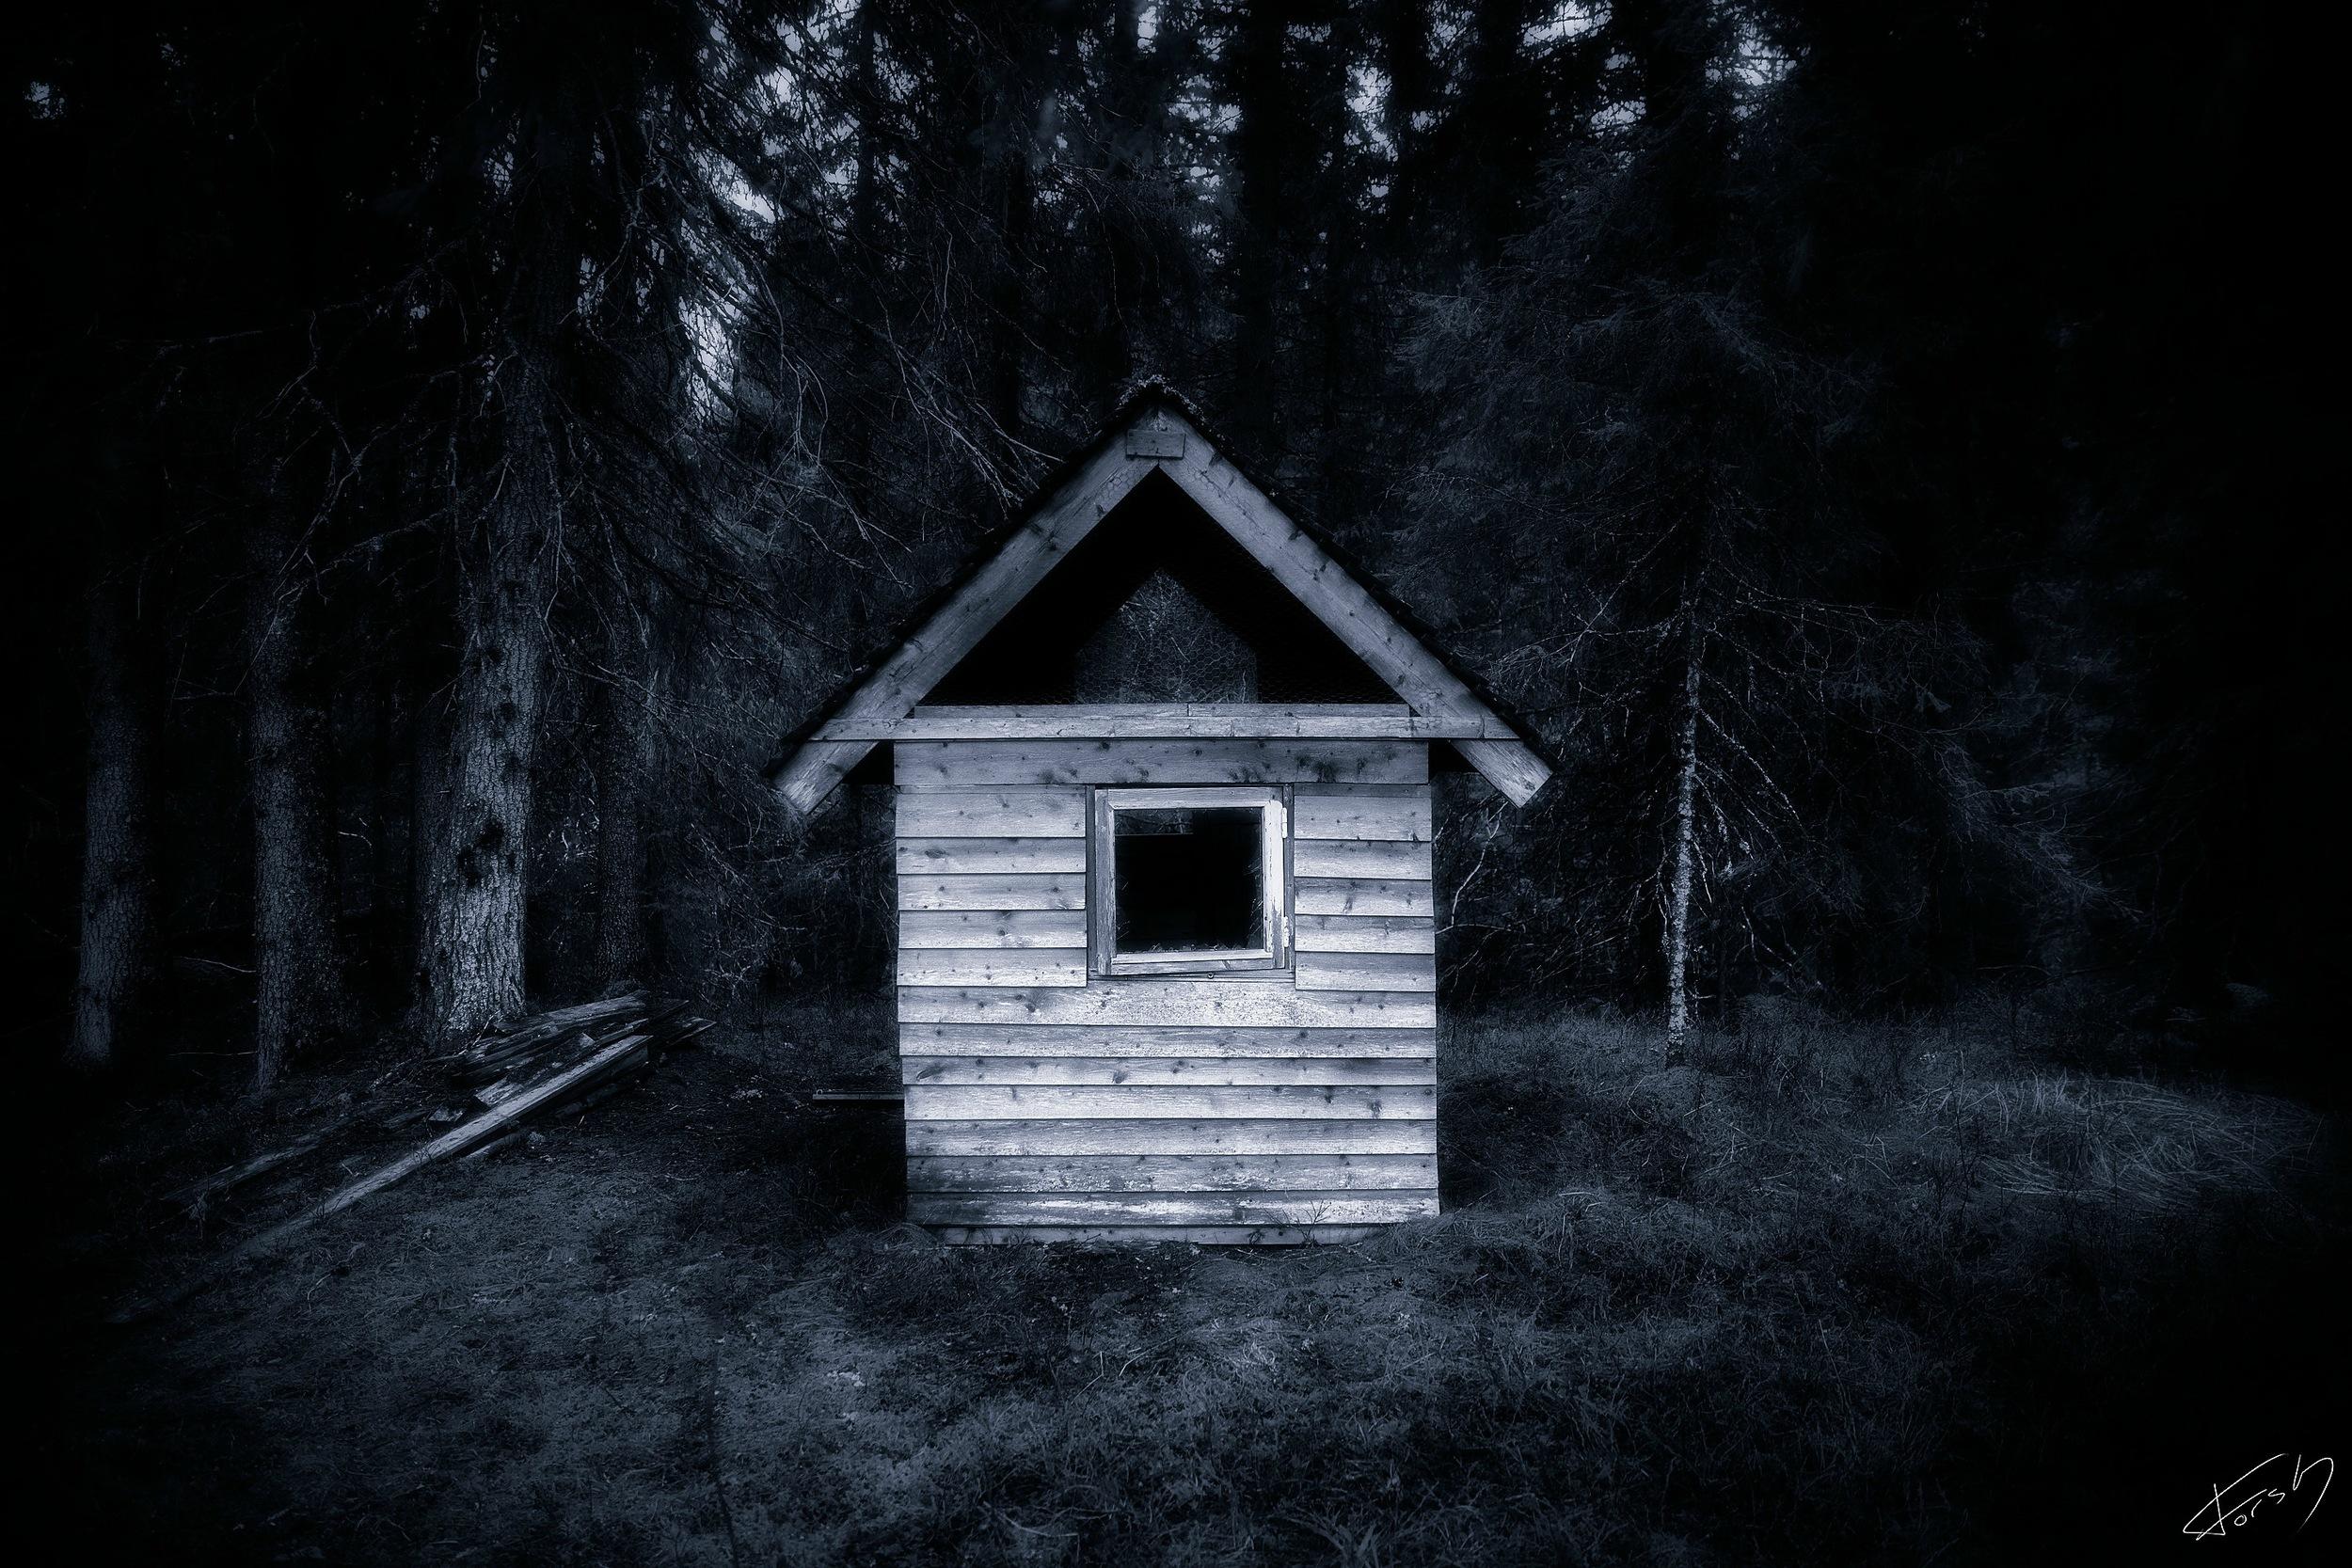 Austere Living / Childhood memories